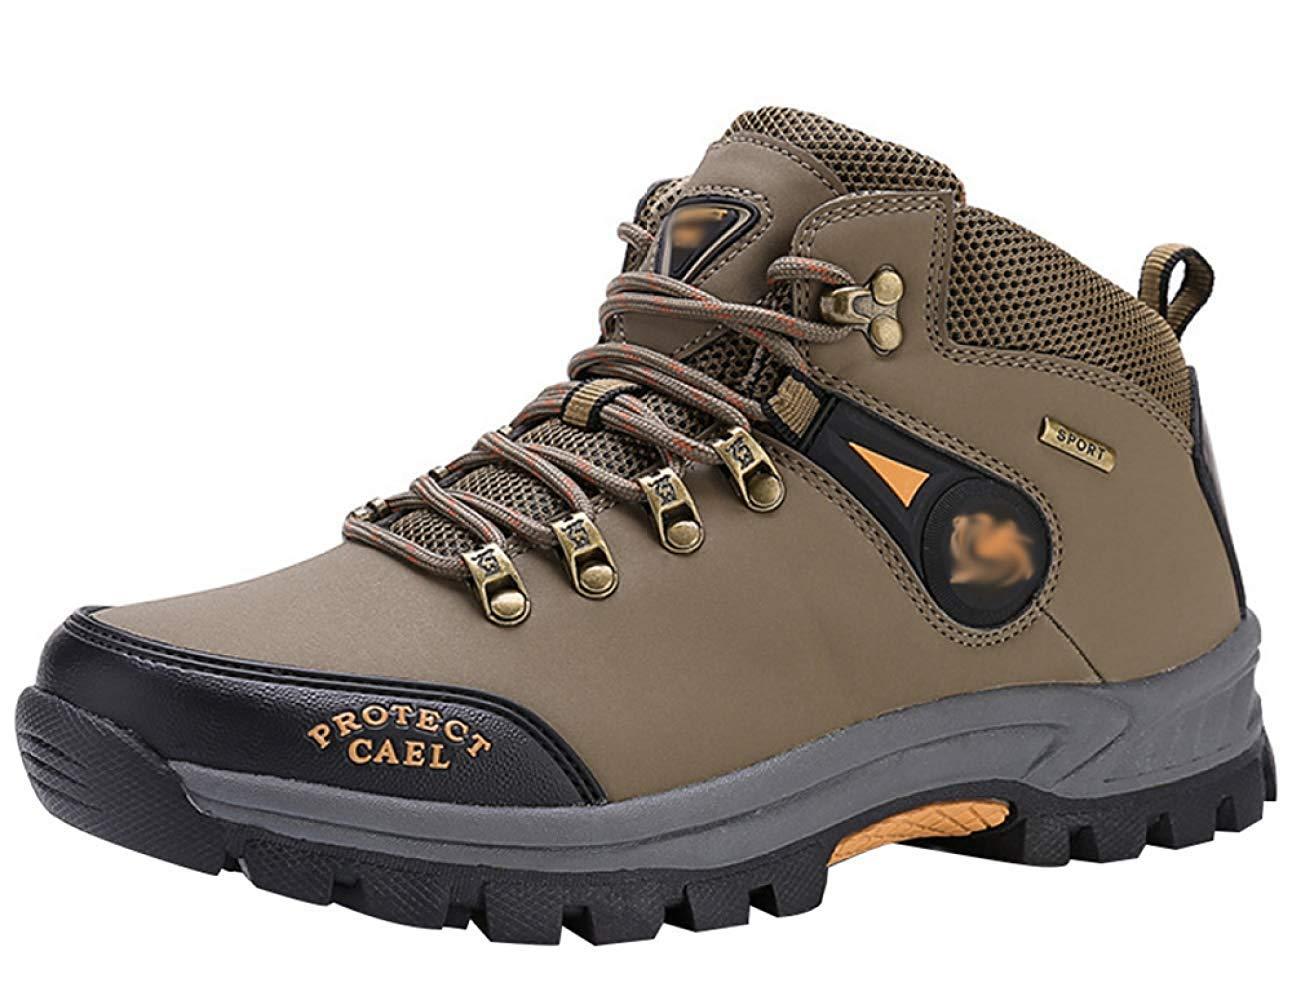 HhGold Männer Wanderschuhe Stiefel Leder Wanderschuhe Turnschuhe Für Outdoor Trekking Training Beiläufige Arbeit (Farbe : 17, Größe : 42EU)